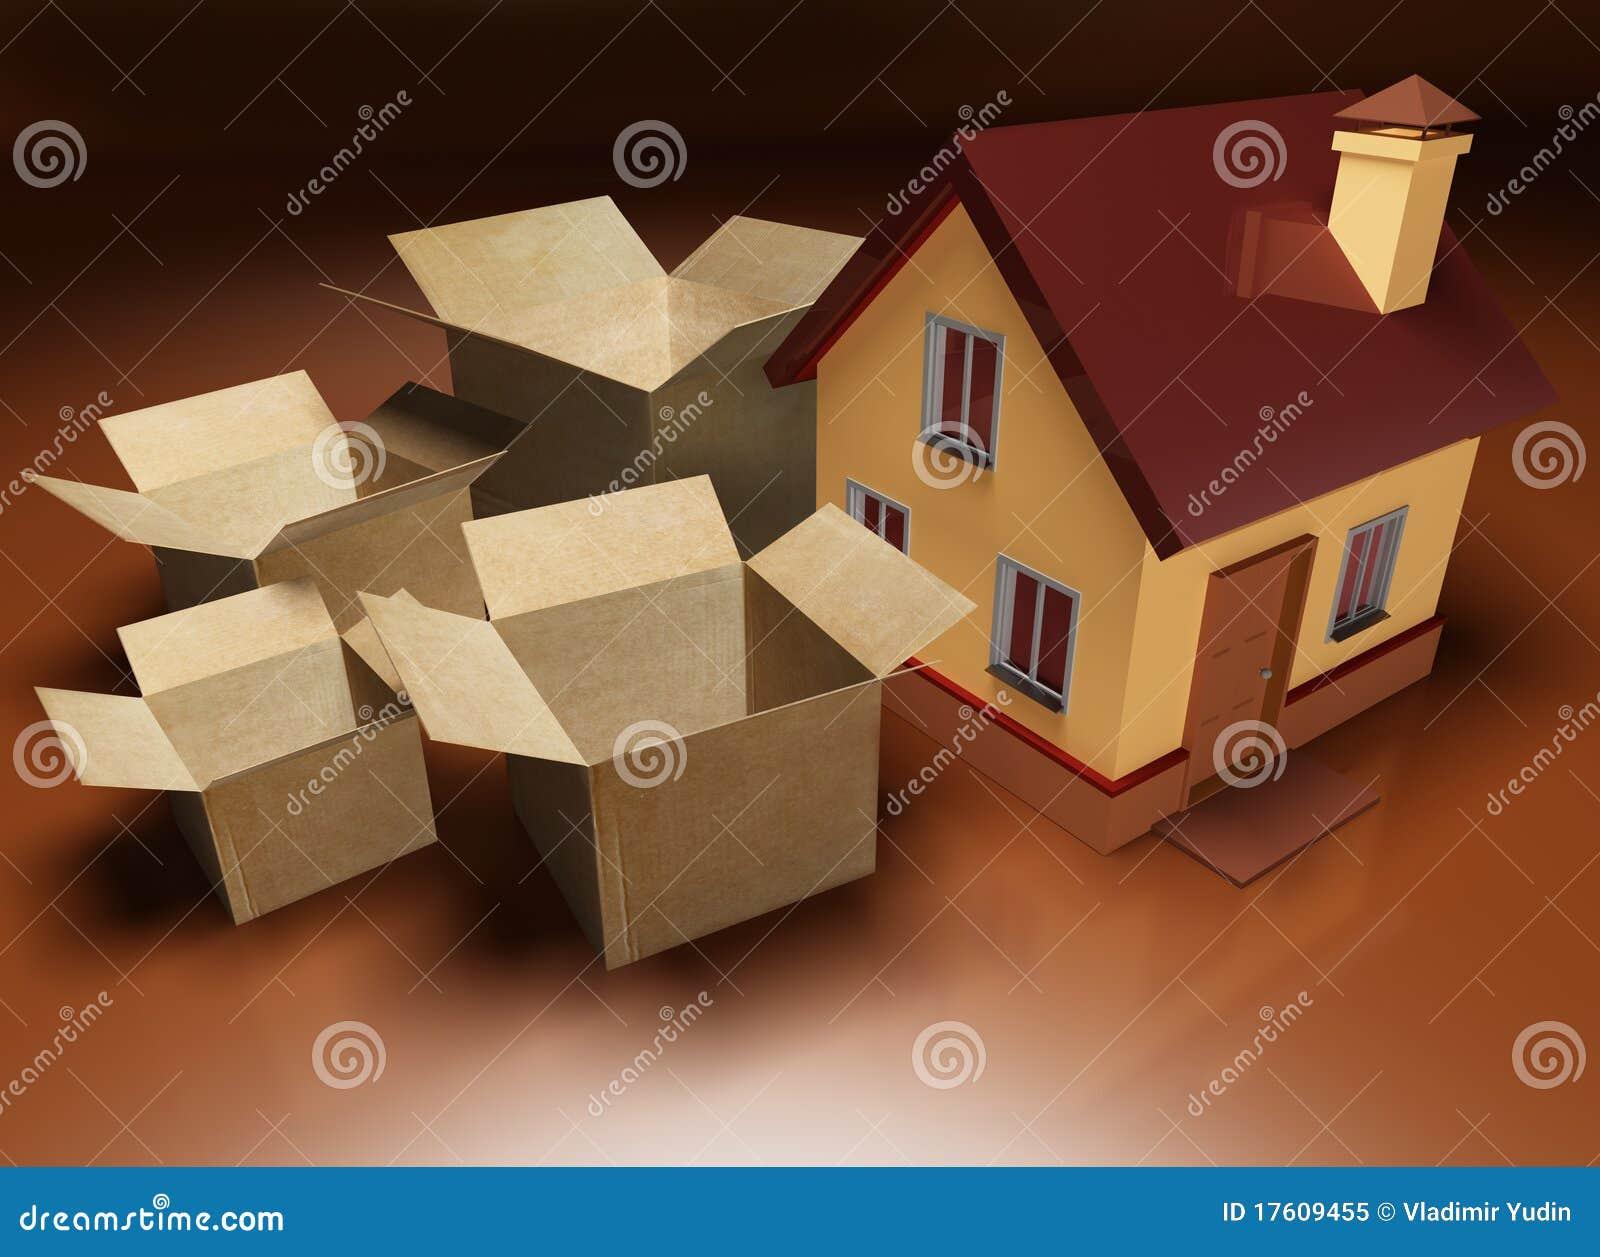 хранение упаковки дома moving следующее к